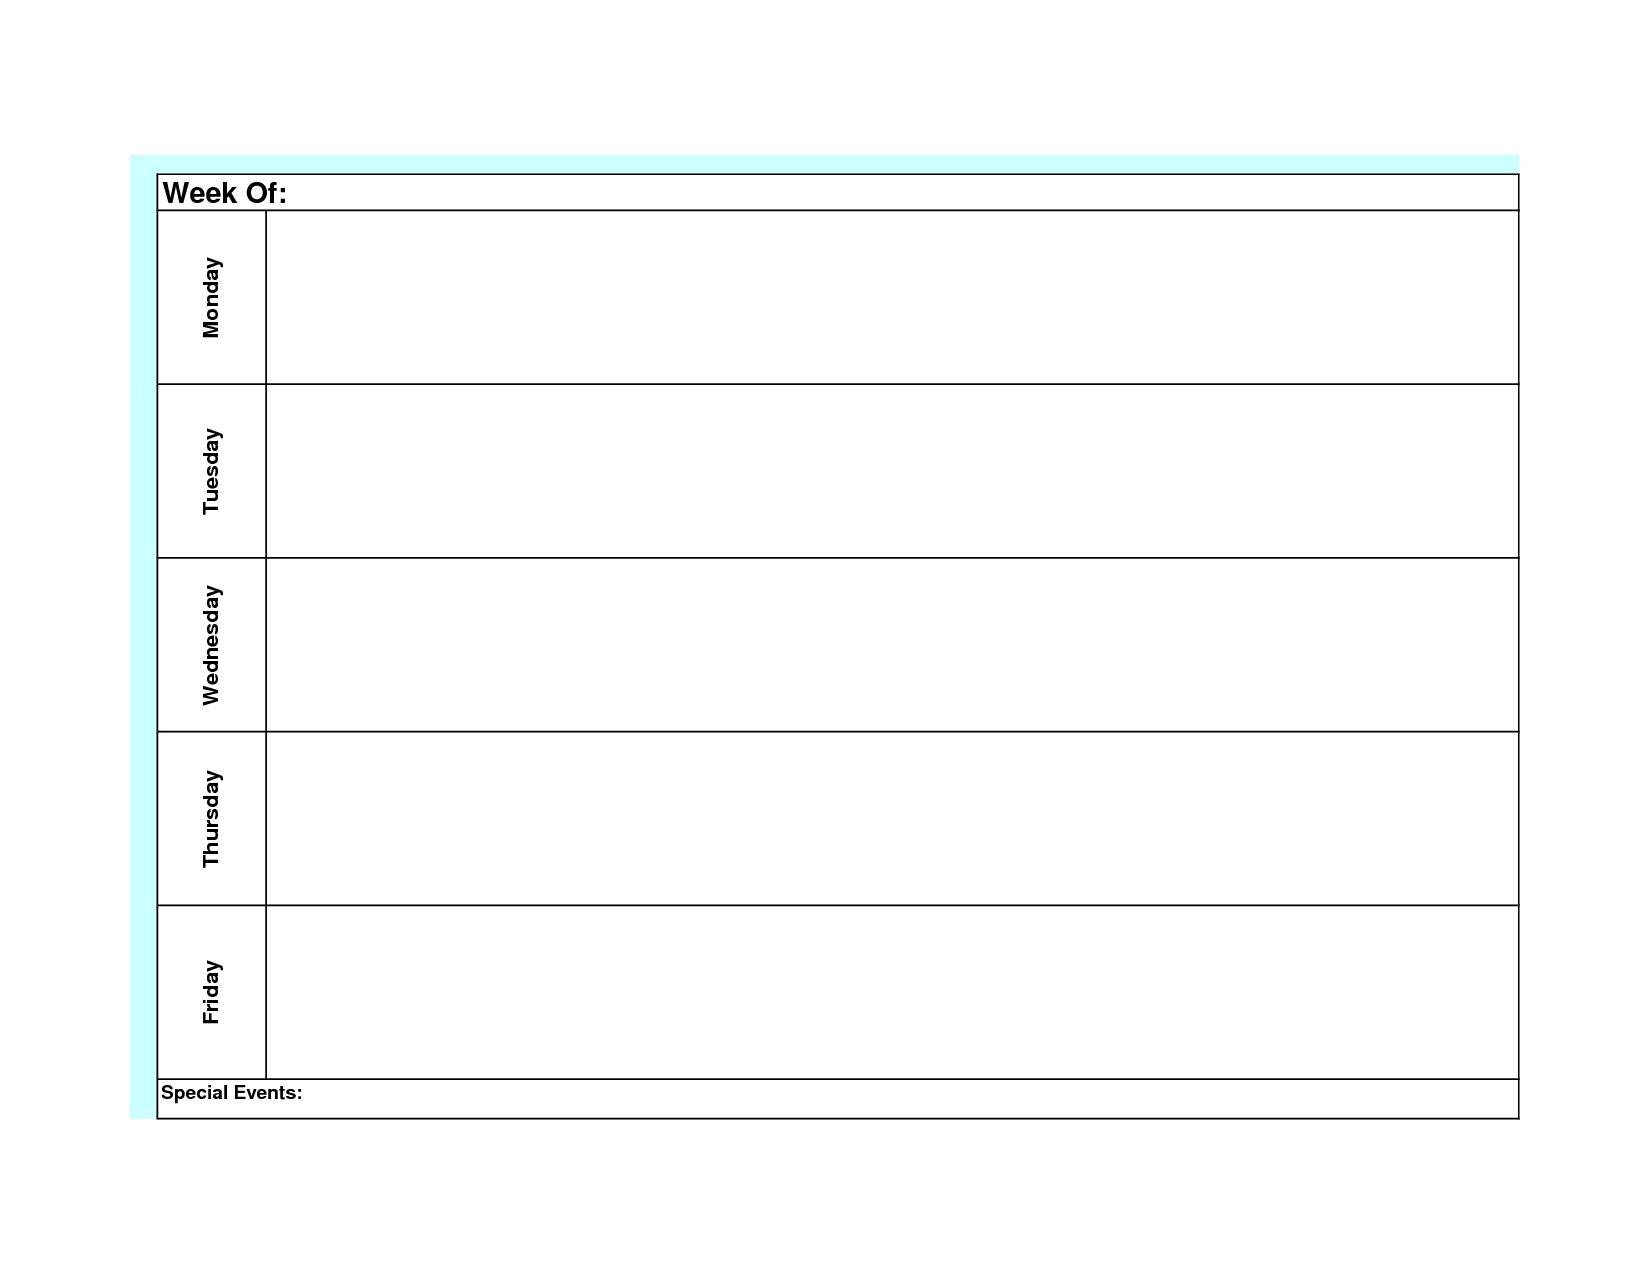 Blank Weekly Calendar Monday Through Friday Template Planner To | Smorad regarding Blank Weekly Monday Through Friday Calendar Template